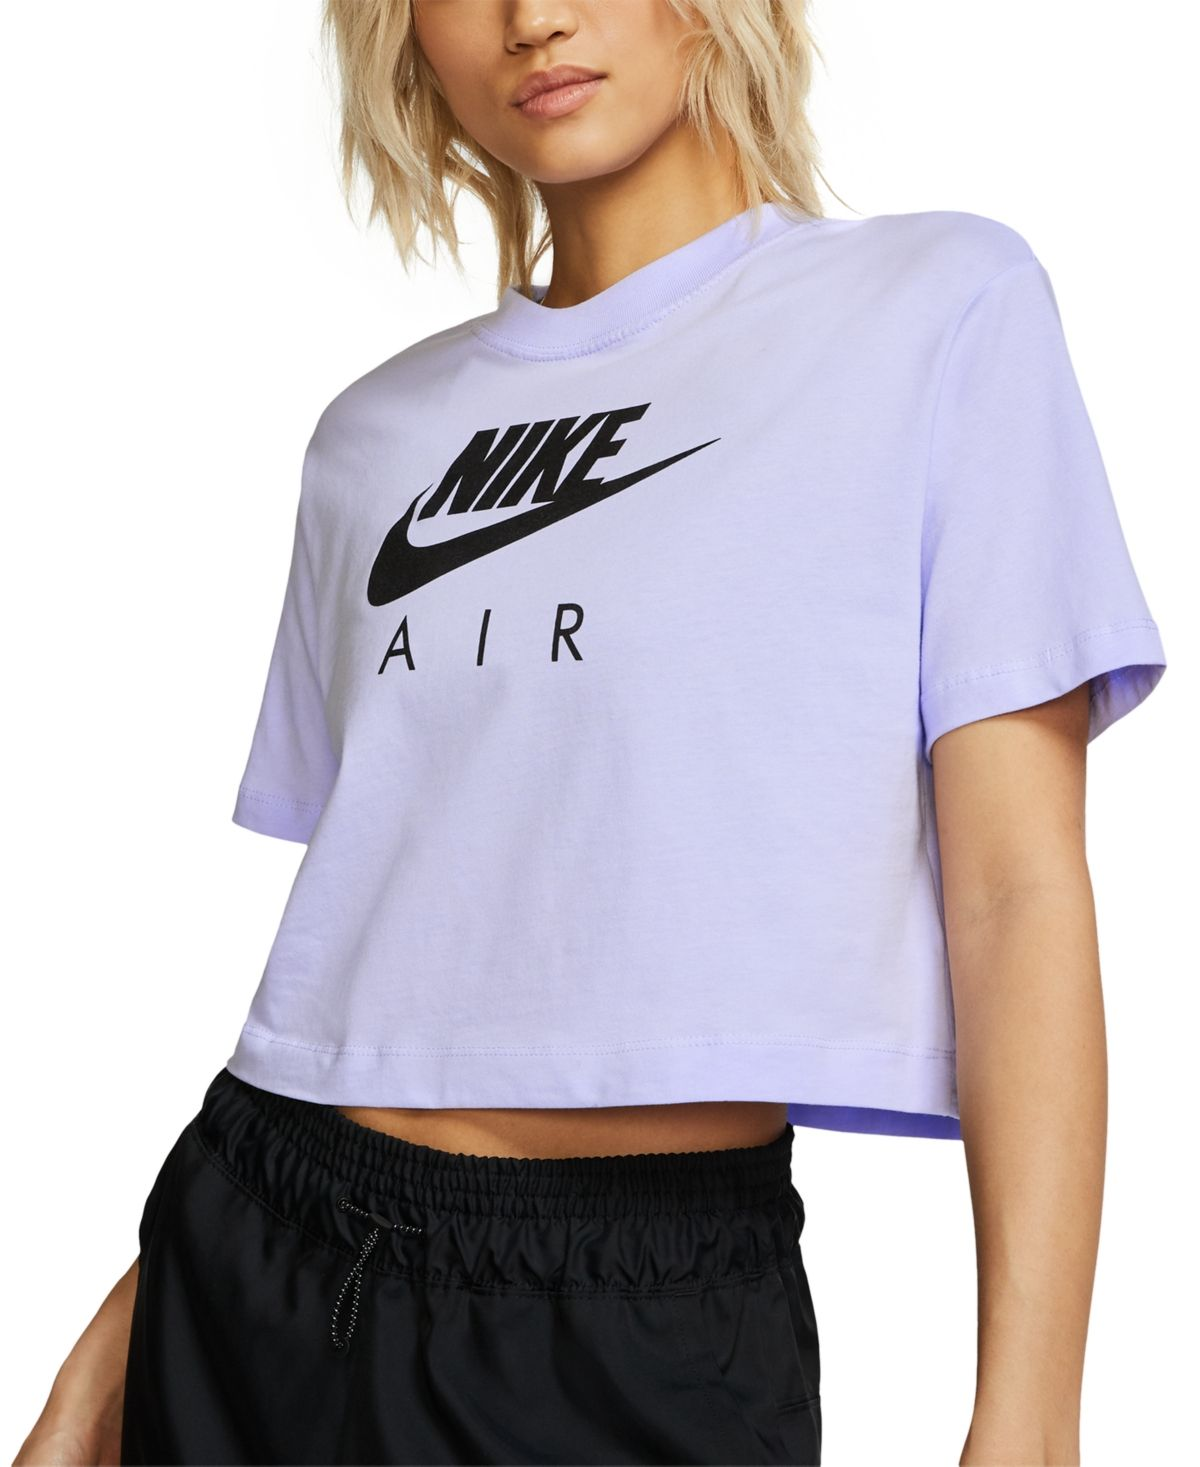 Nike Women S Air Cotton Cropped Top Lavender Mist Clothes Womens Clothing Tops Cotton Crop Top [ 1467 x 1200 Pixel ]